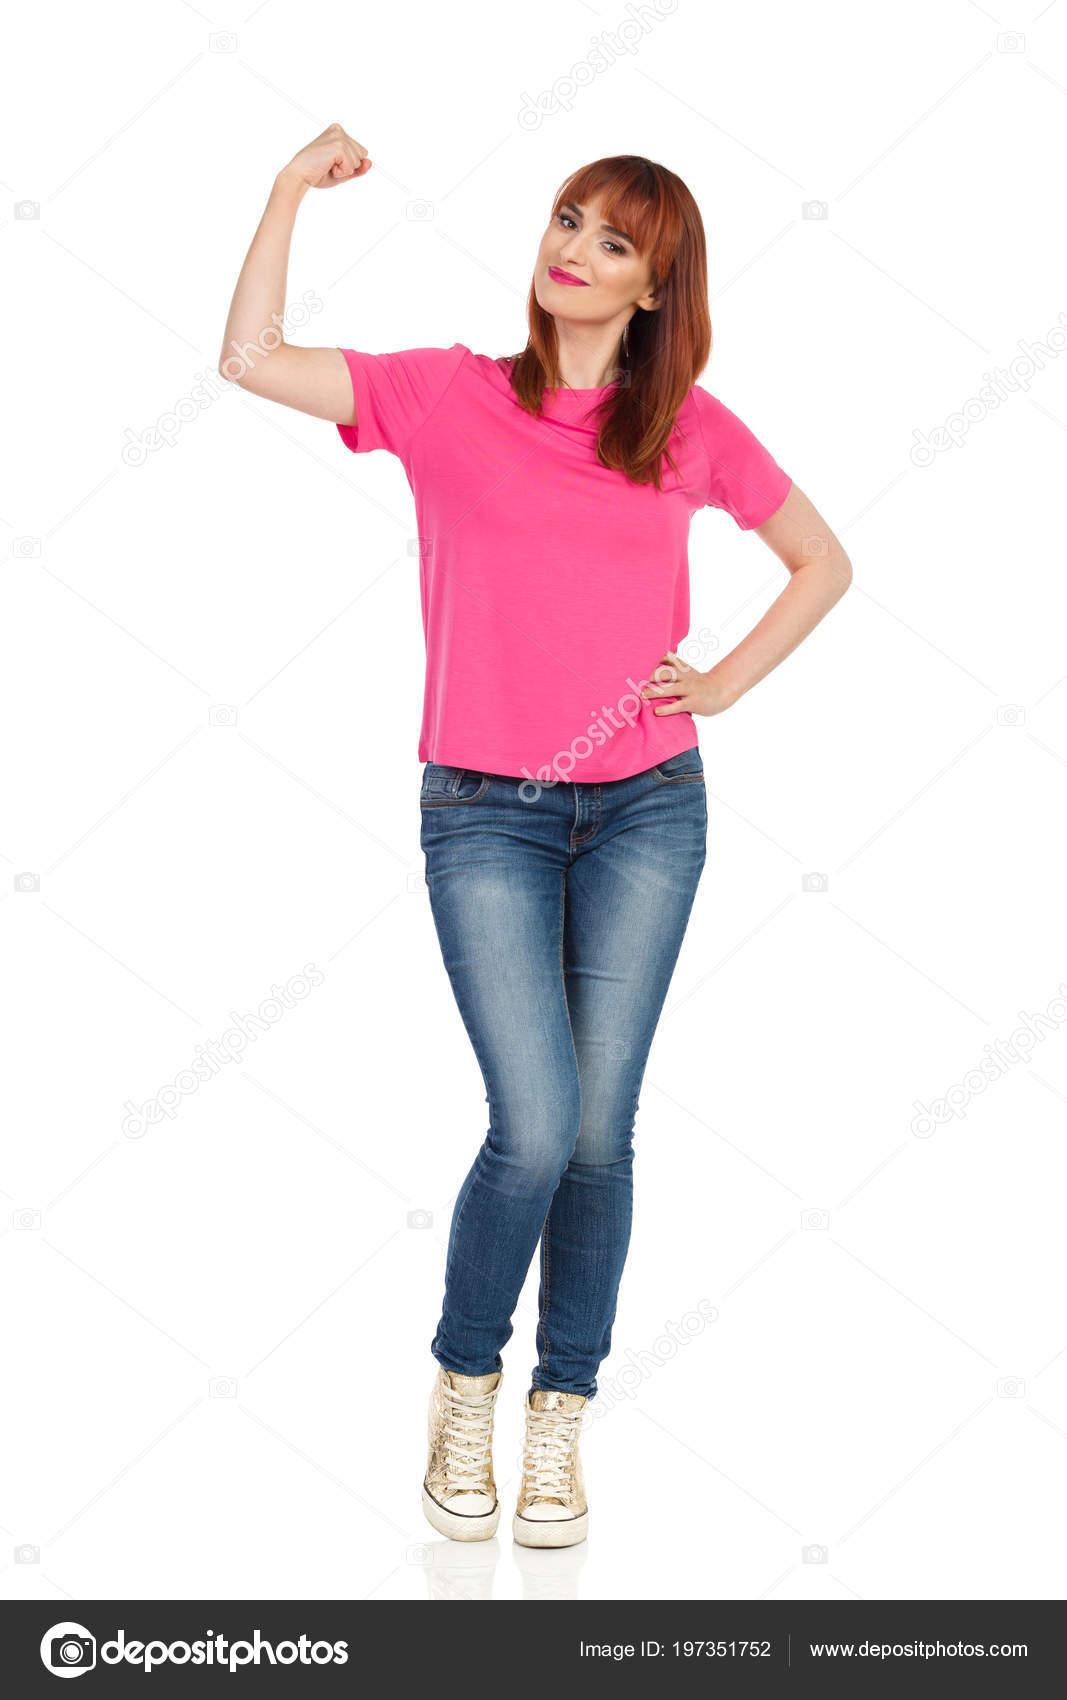 f6b8e33a3928 Ευτυχισμένος Νεαρή Γυναίκα Ροζ Μπλουζάκι Τζιν Και Χρυσό Πάνινα Παπούτσια–  εικόνα αρχείου